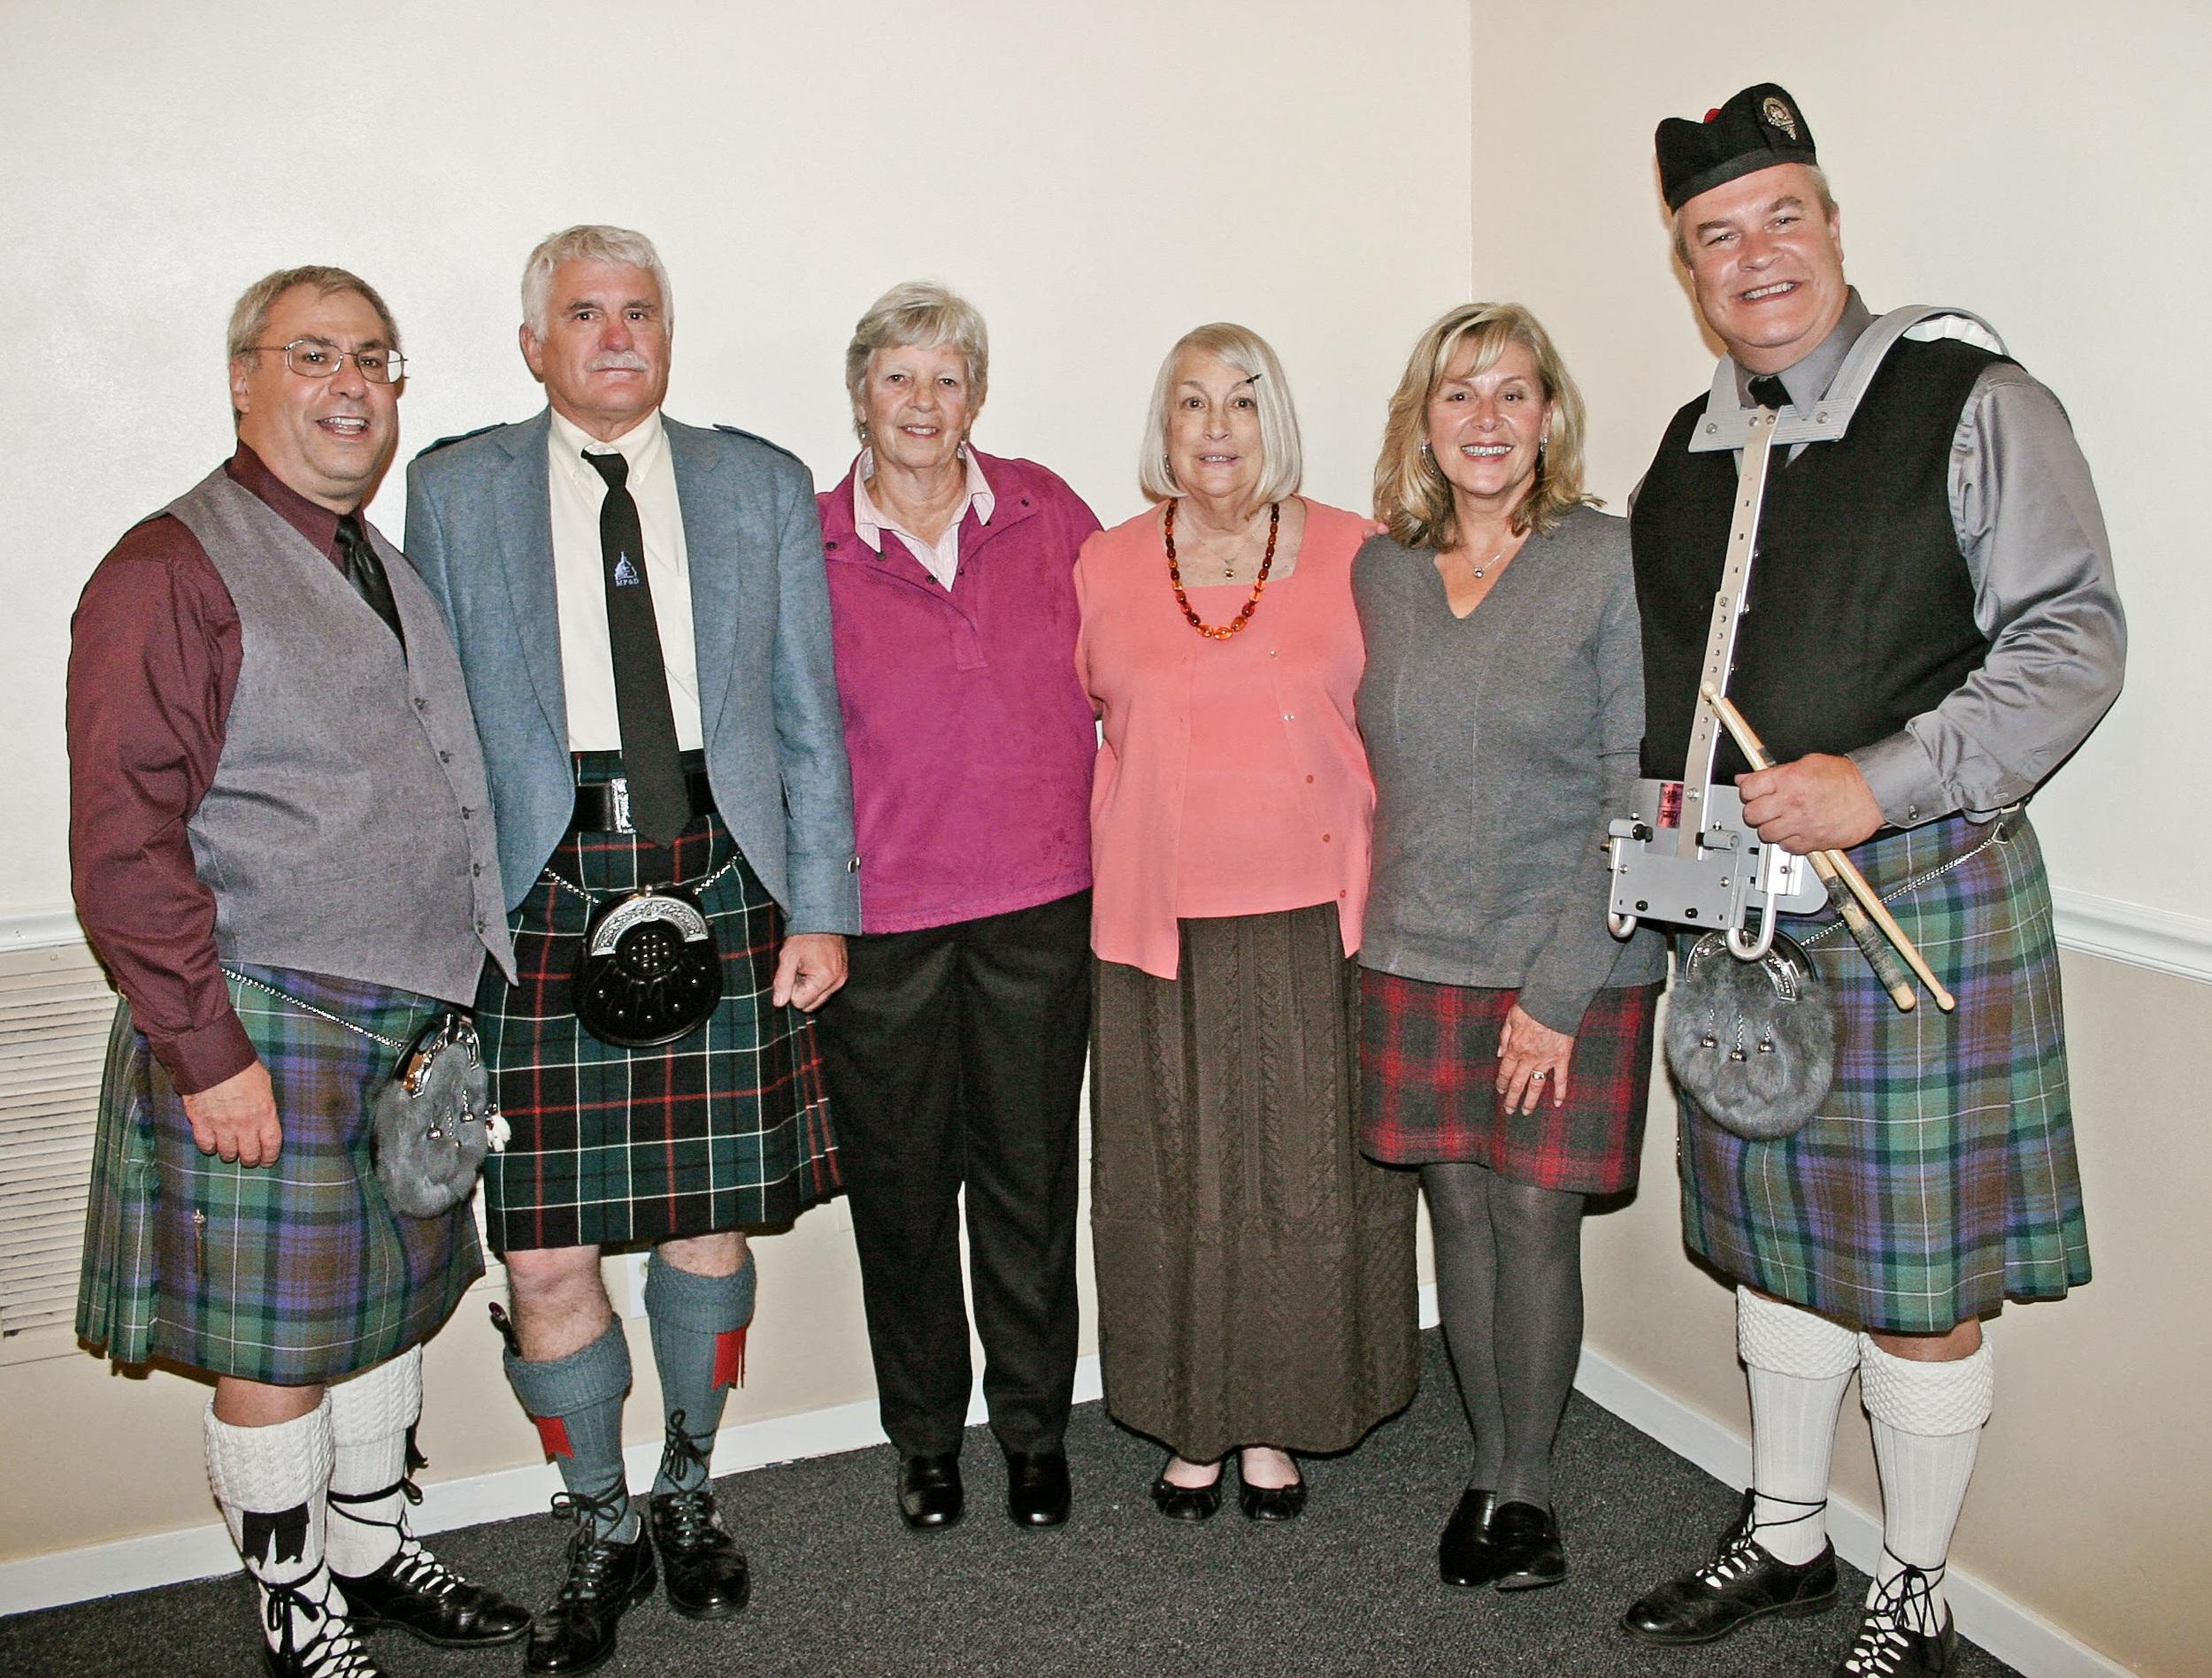 2014-Fall-Highland-Gathering (25 of 26).jpg